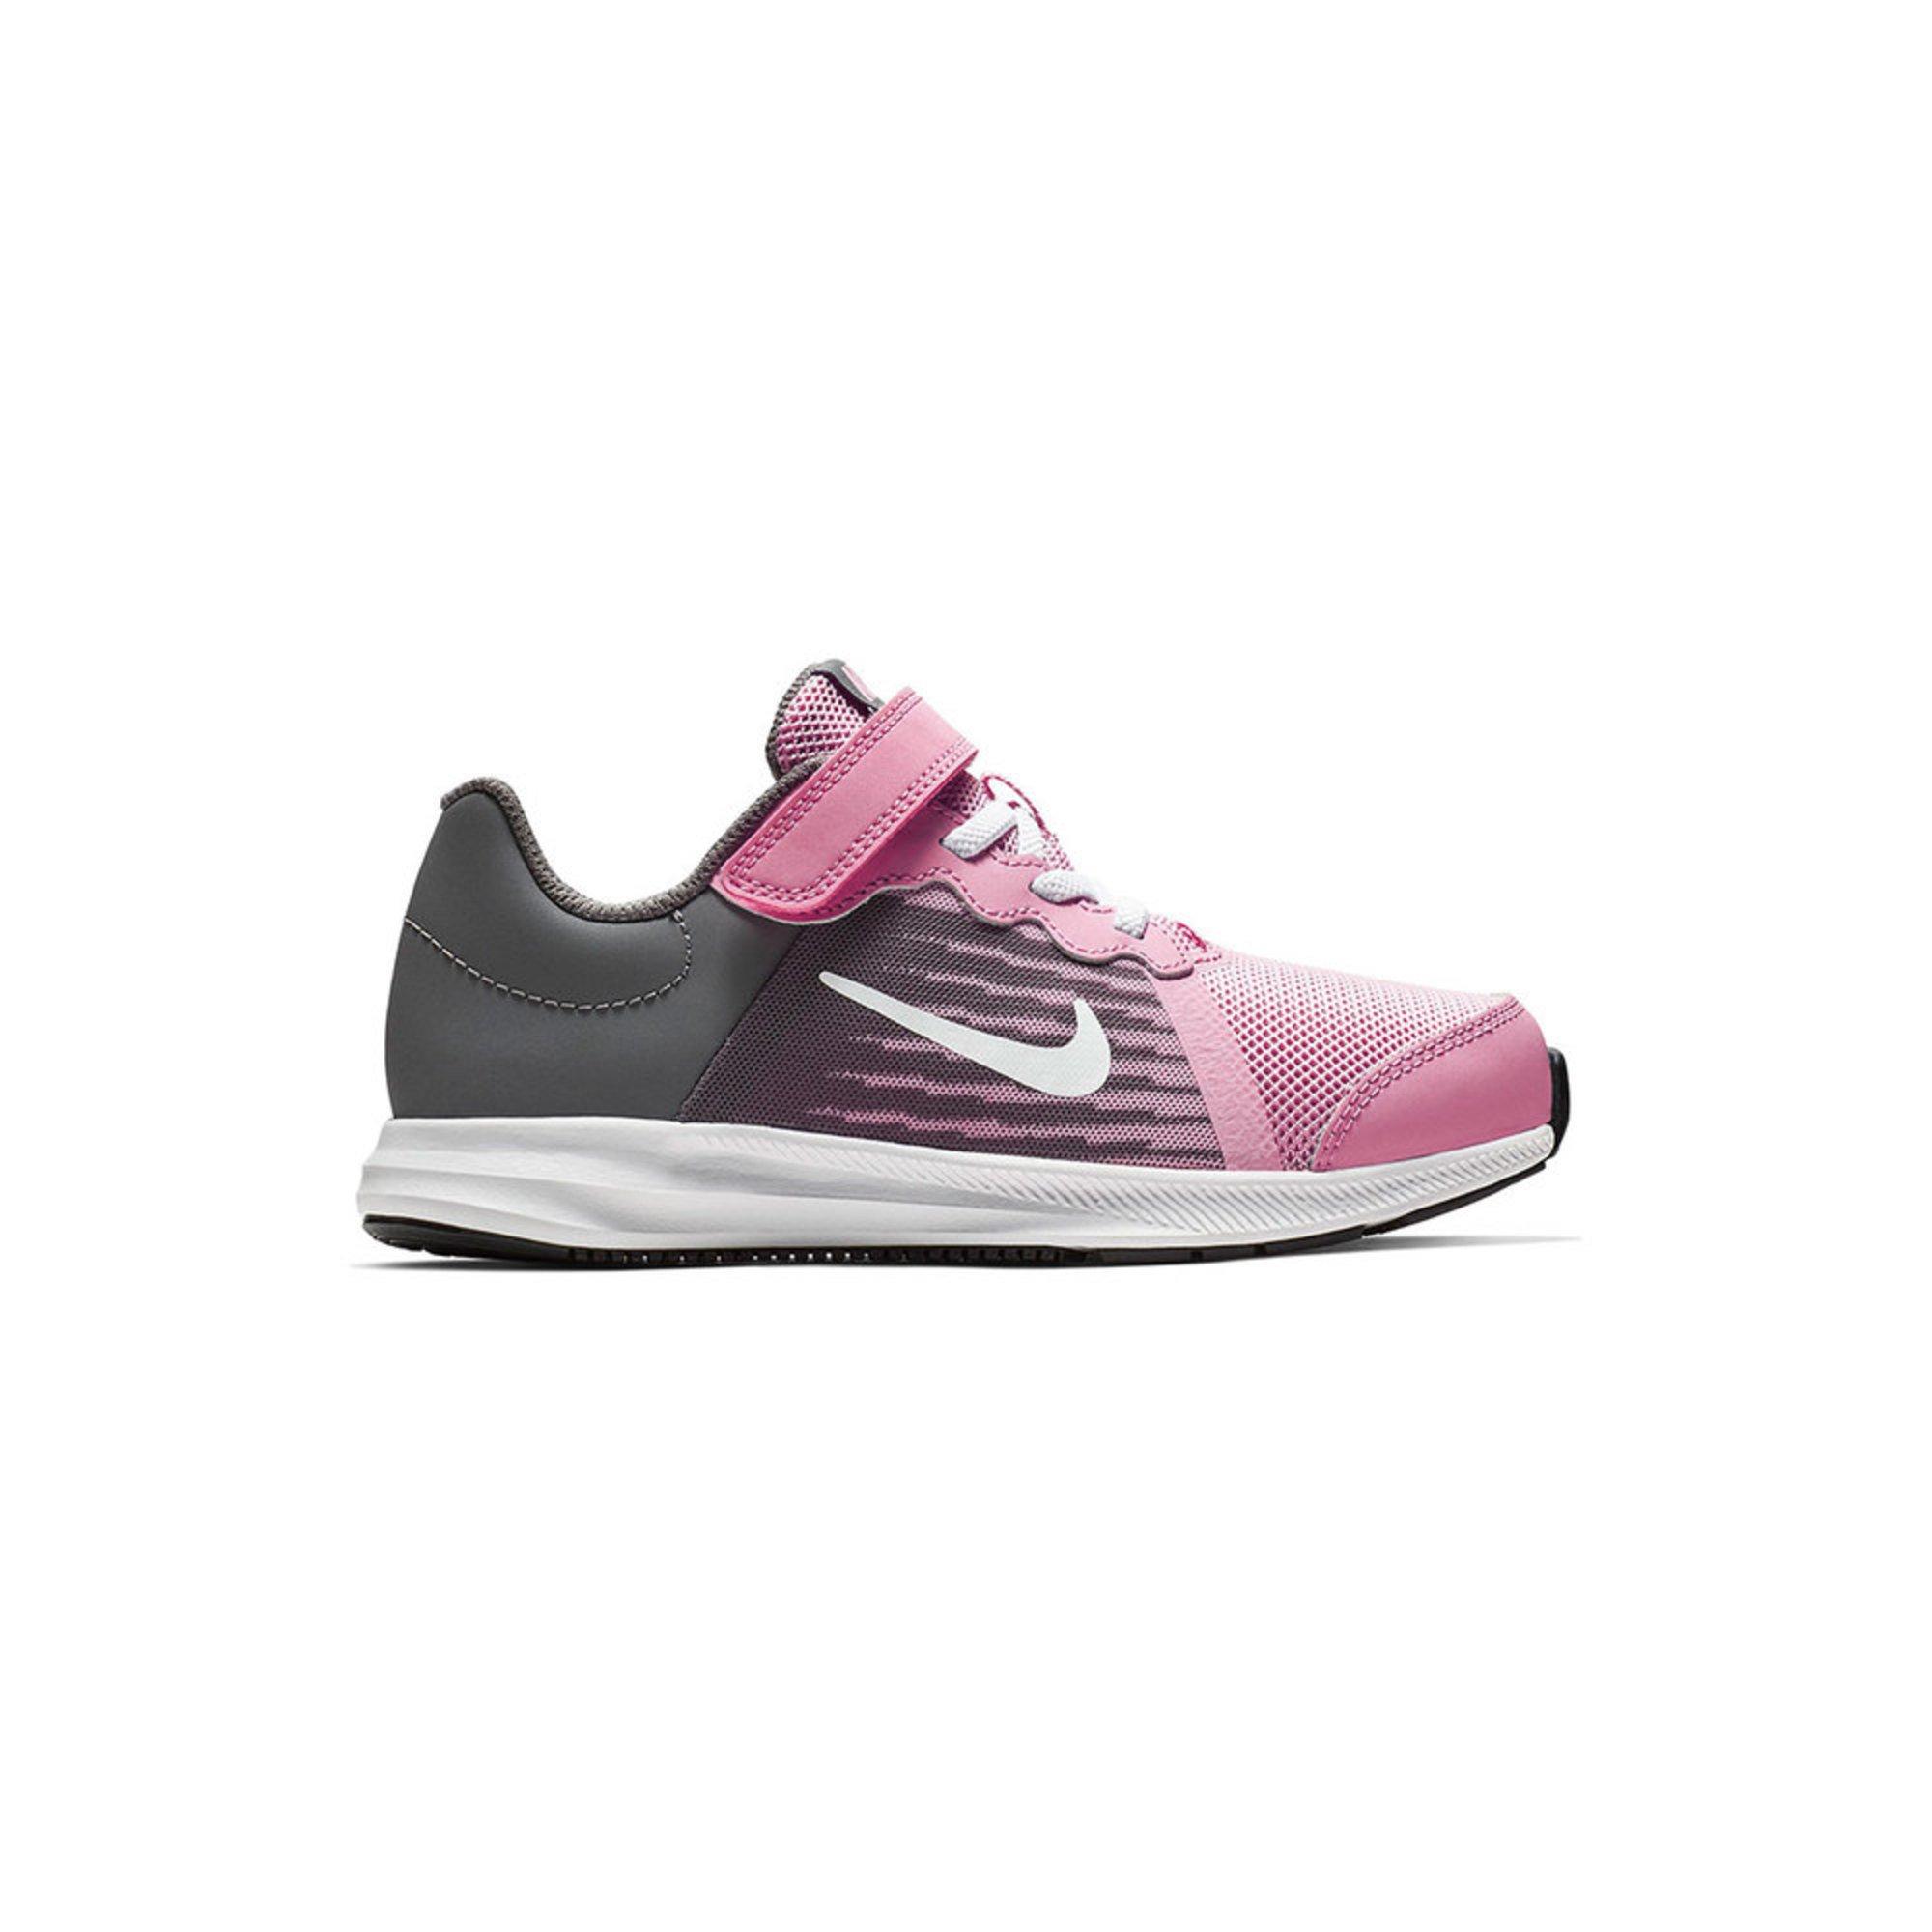 pretty nice 08b0c 4605c Nike. Nike Girls Downshifter 8 ...